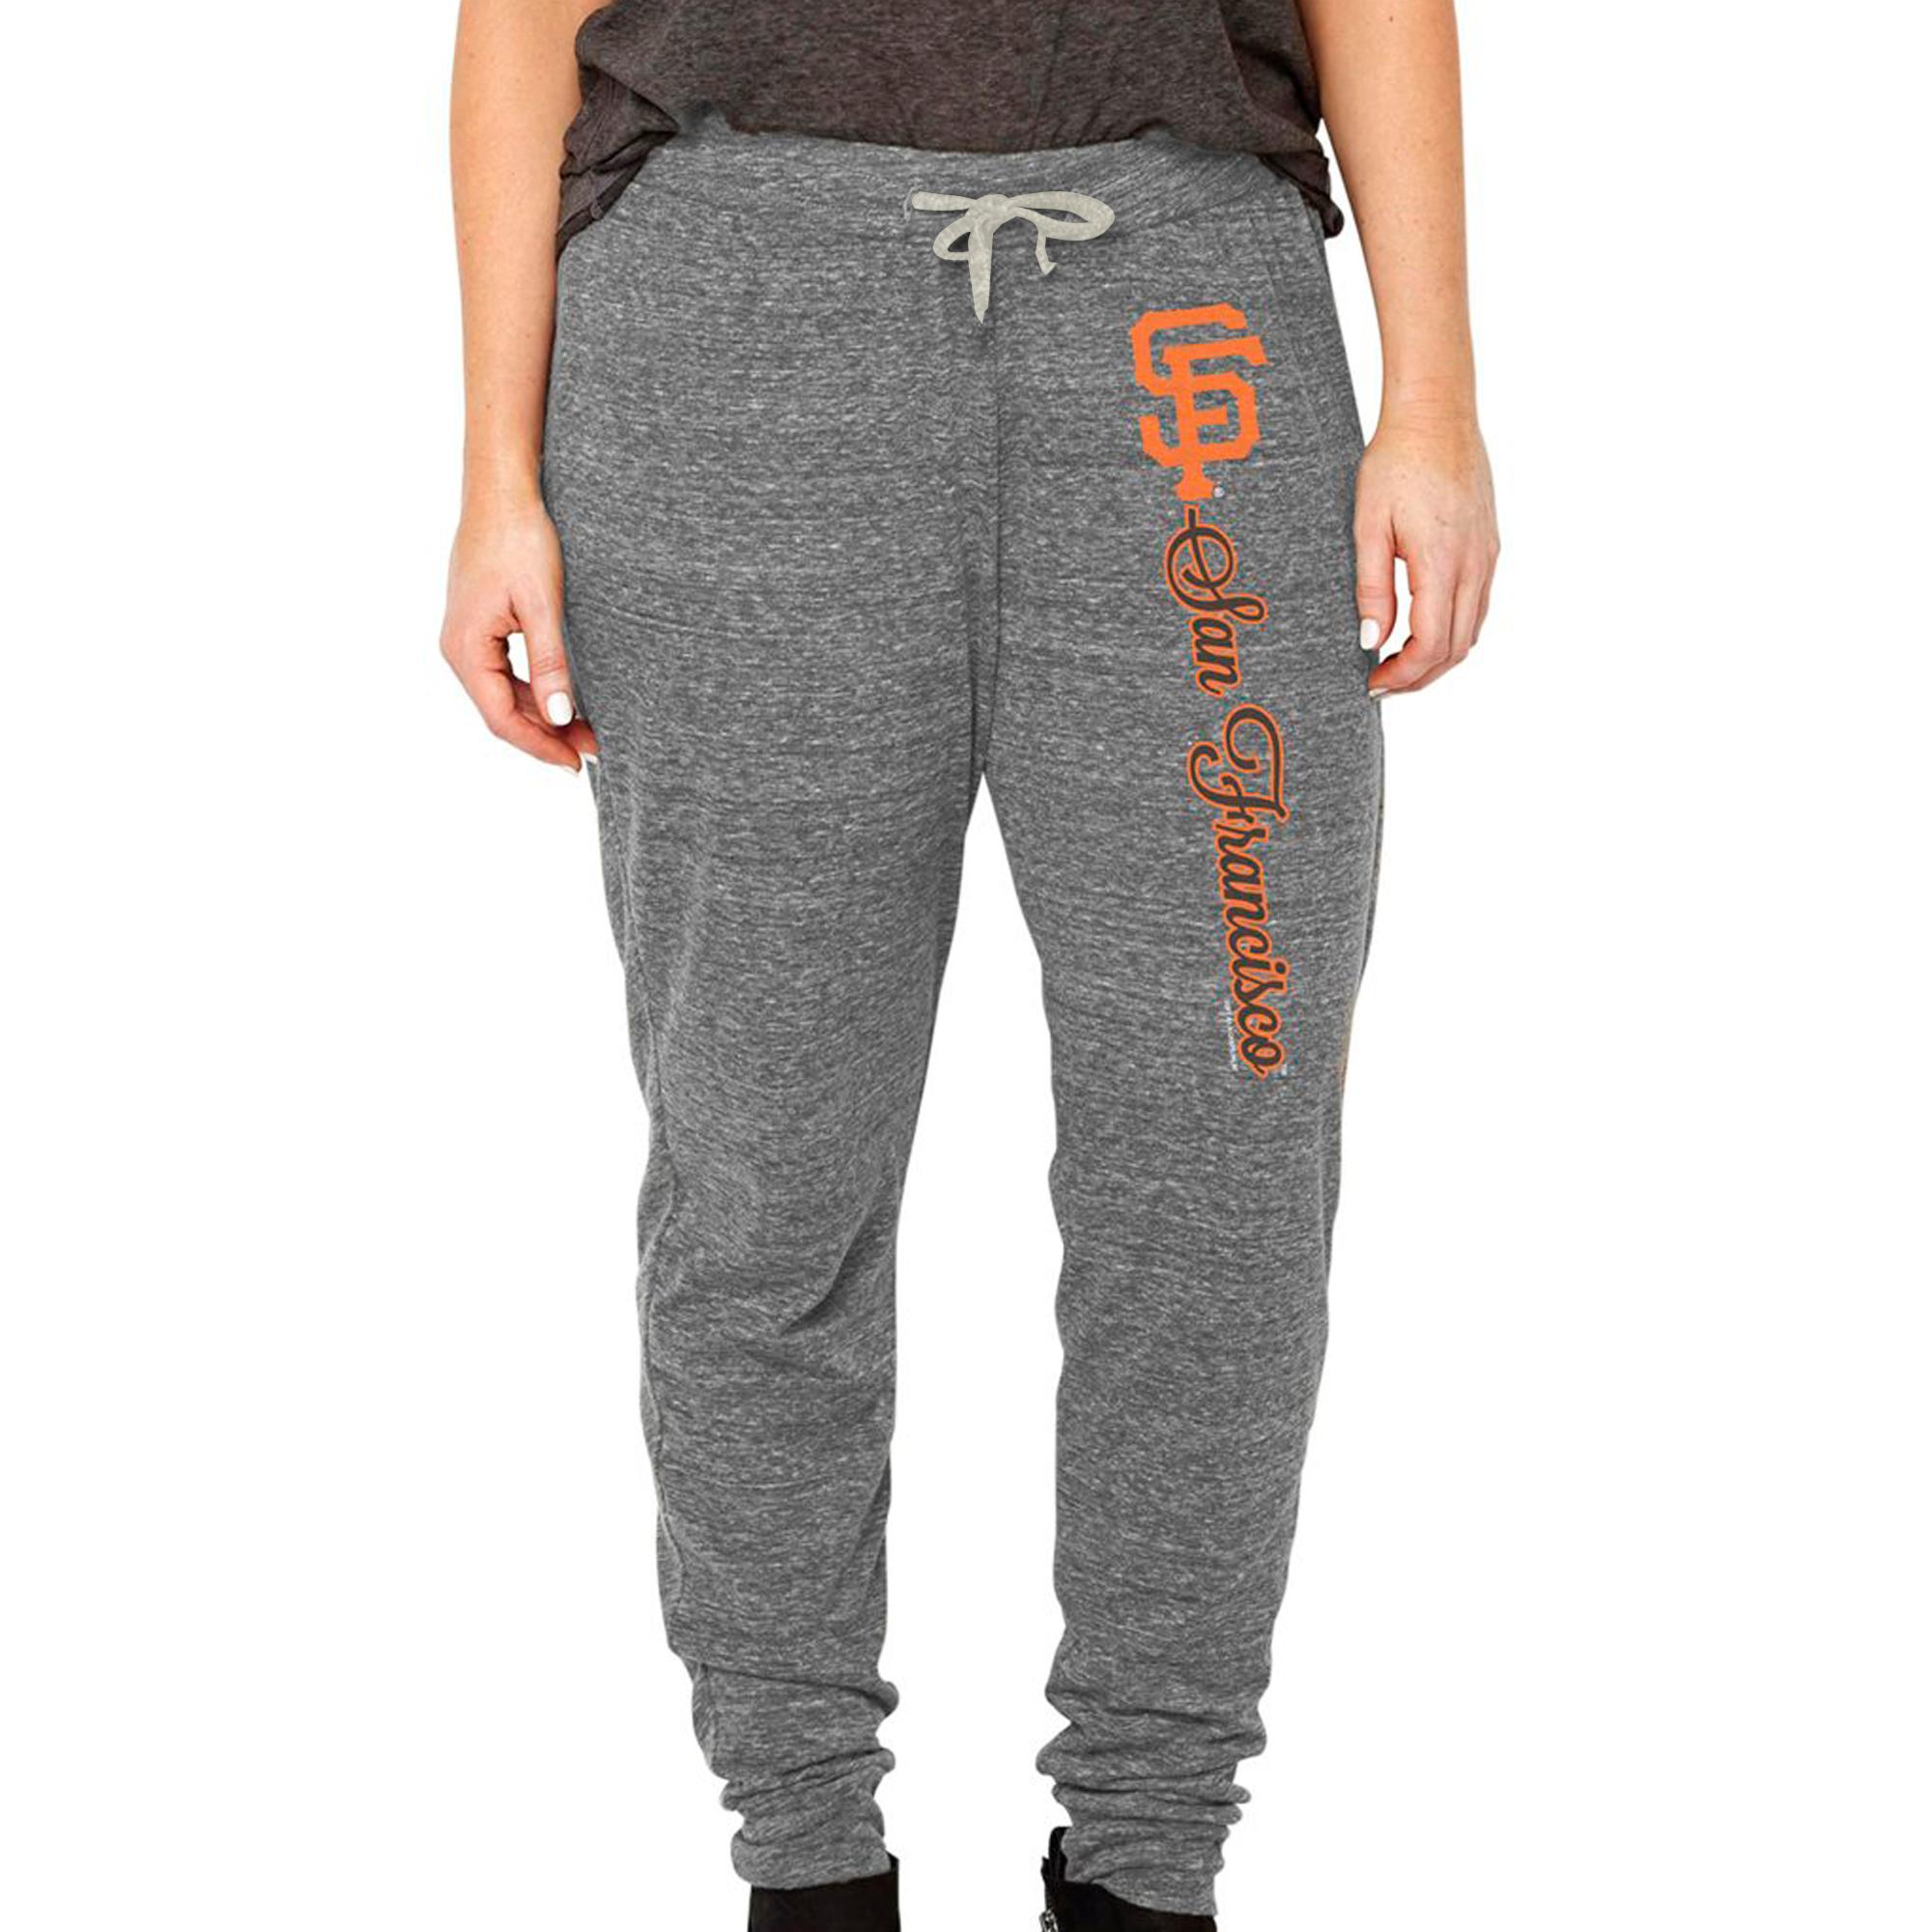 San Francisco Giants Soft as a Grape Women's Plus Size Jogger Pants - Heathered Gray